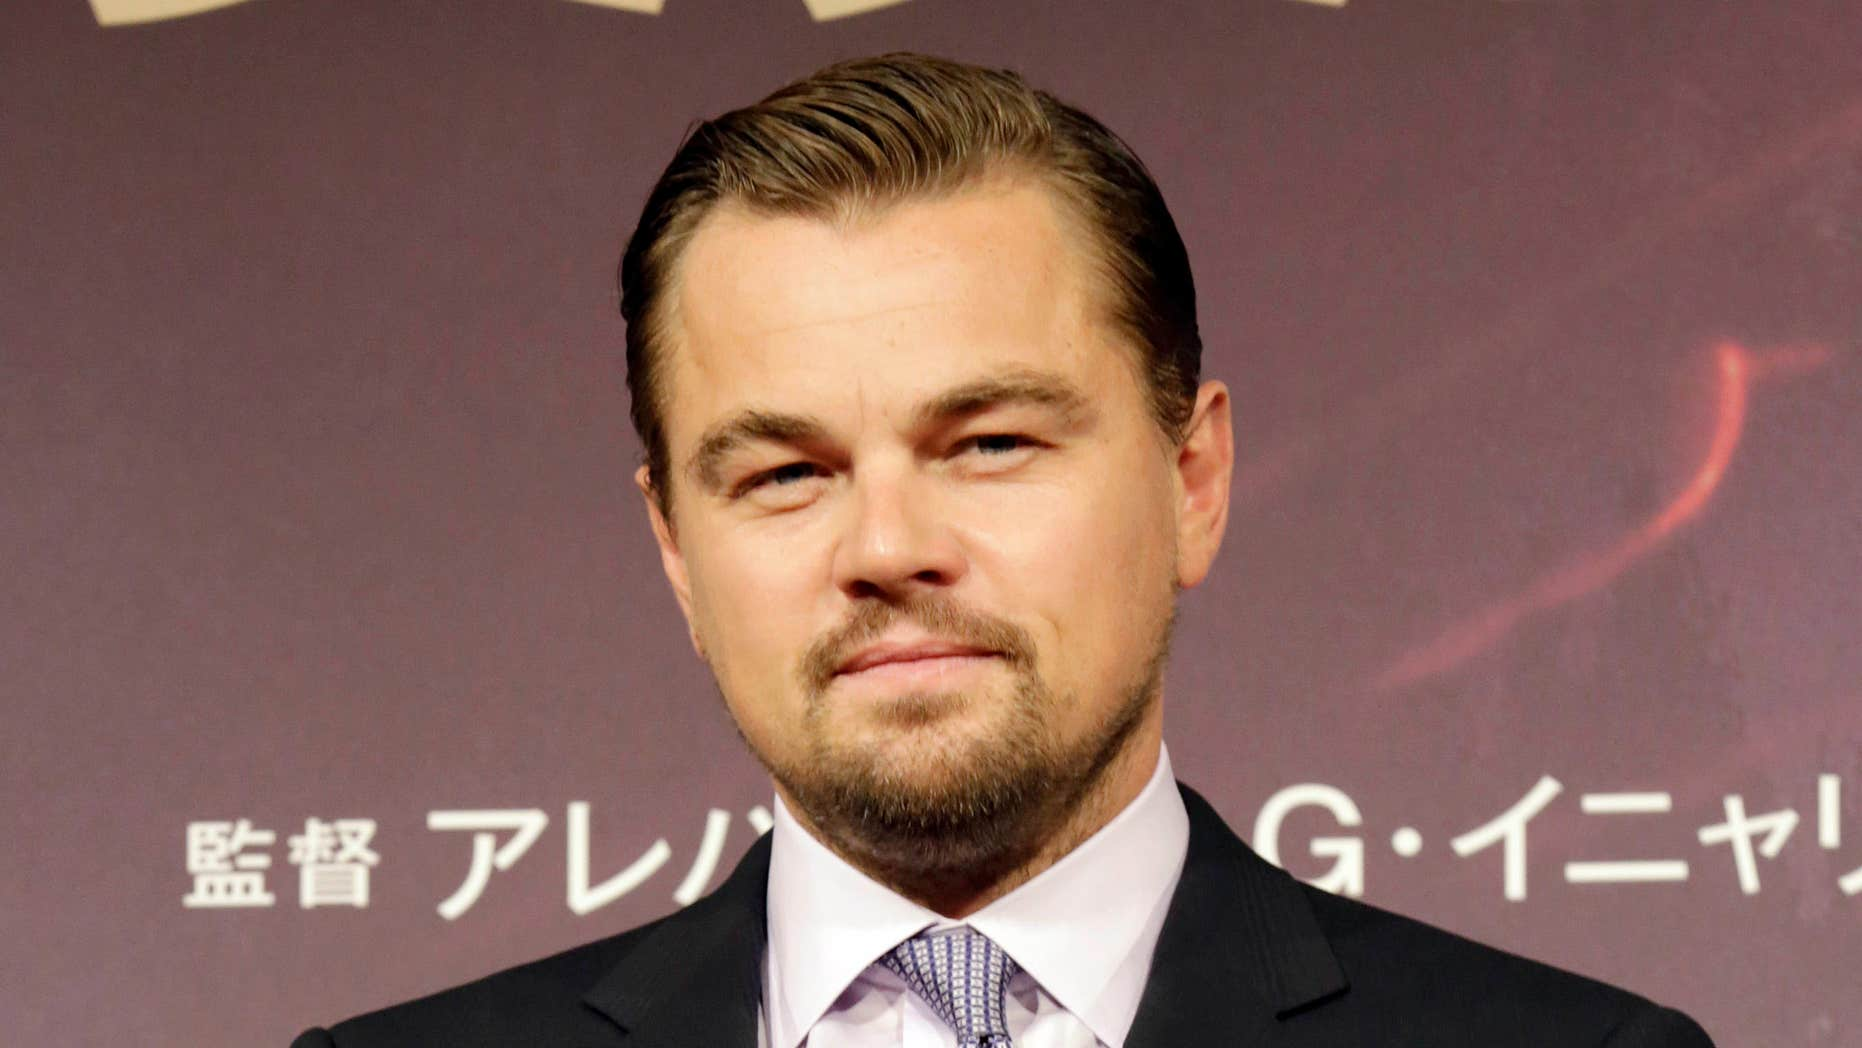 Leonardo DiCaprio Is Donating His Wealth To Save The World Leonardo DiCaprio Is Donating His Wealth To Save The World new picture